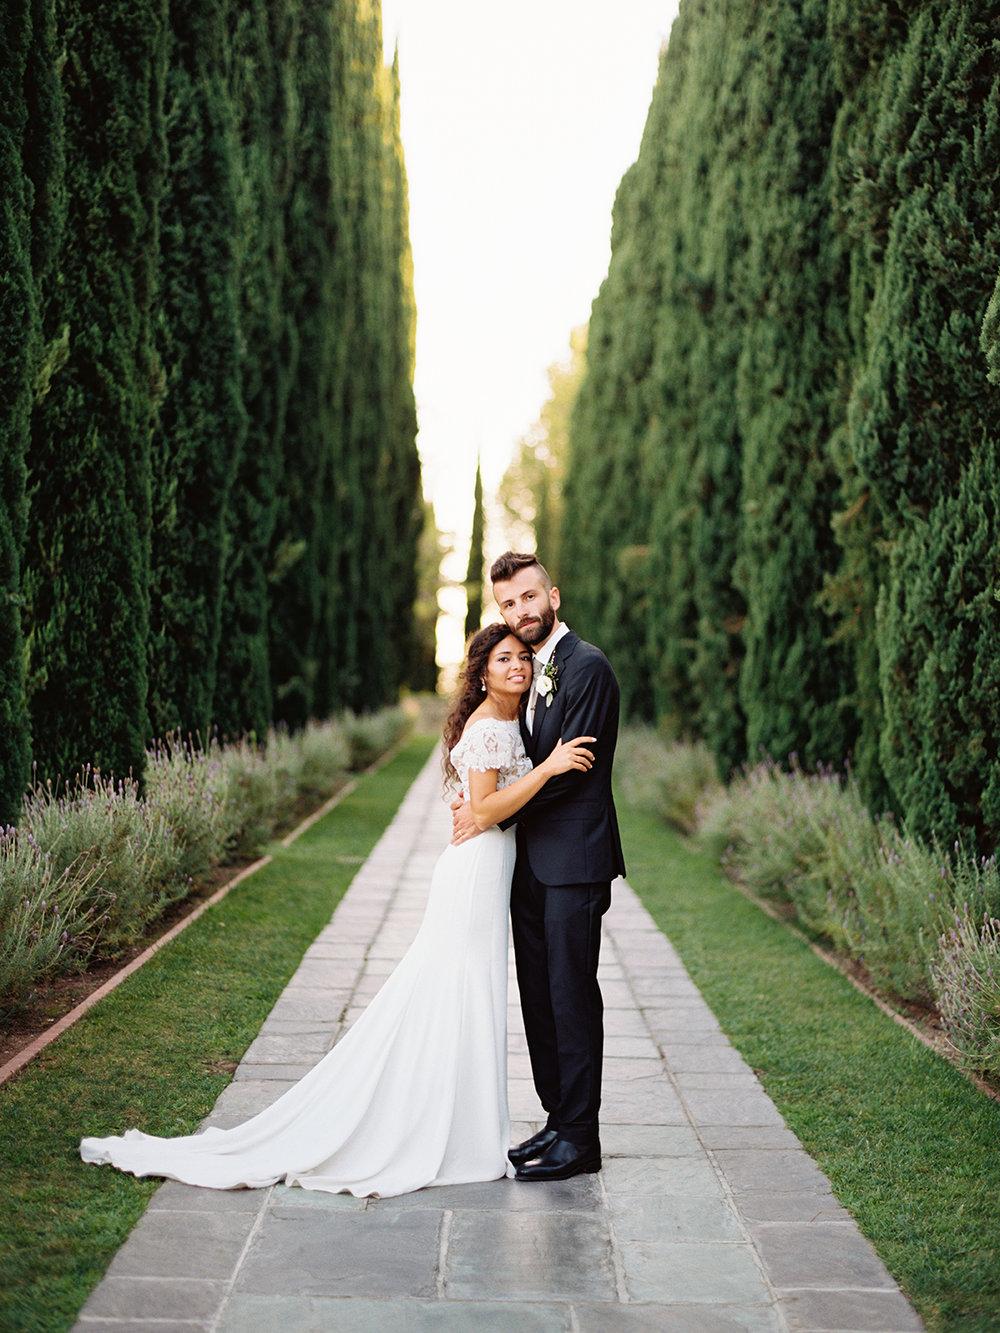 308-brian-sarra-los-angeles-wedding-brumley-wells-photography.jpg